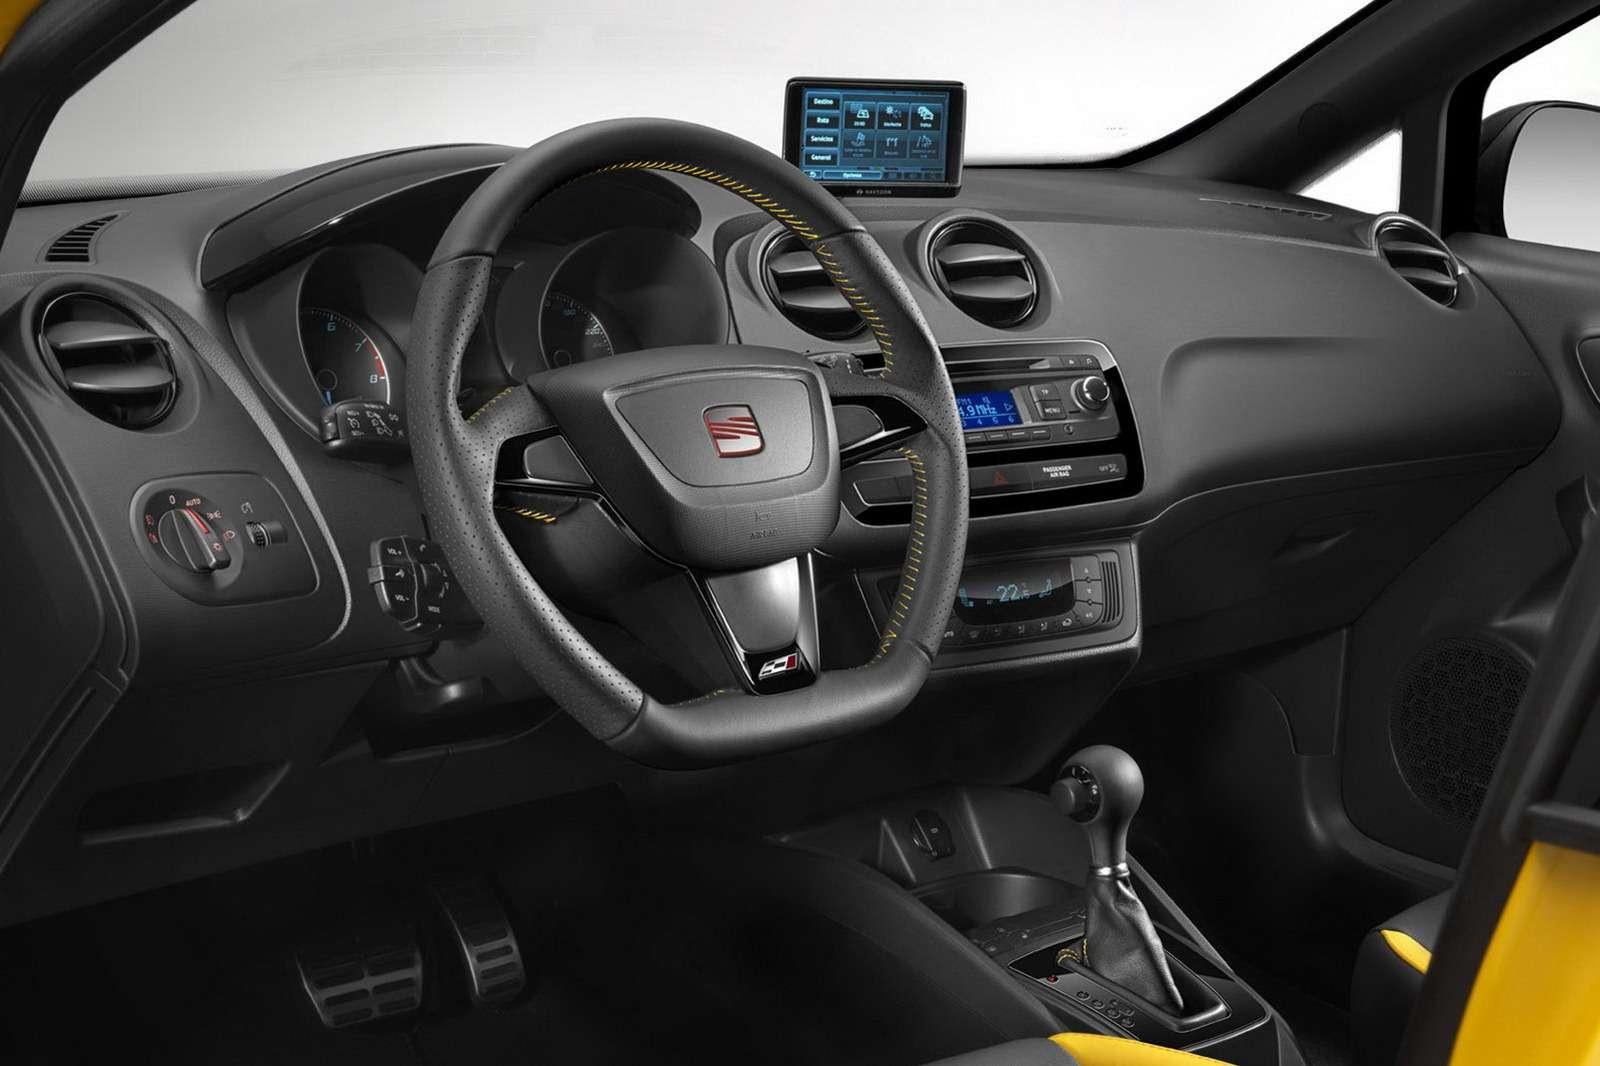 Seat Ibiza Cupra facelift 2012